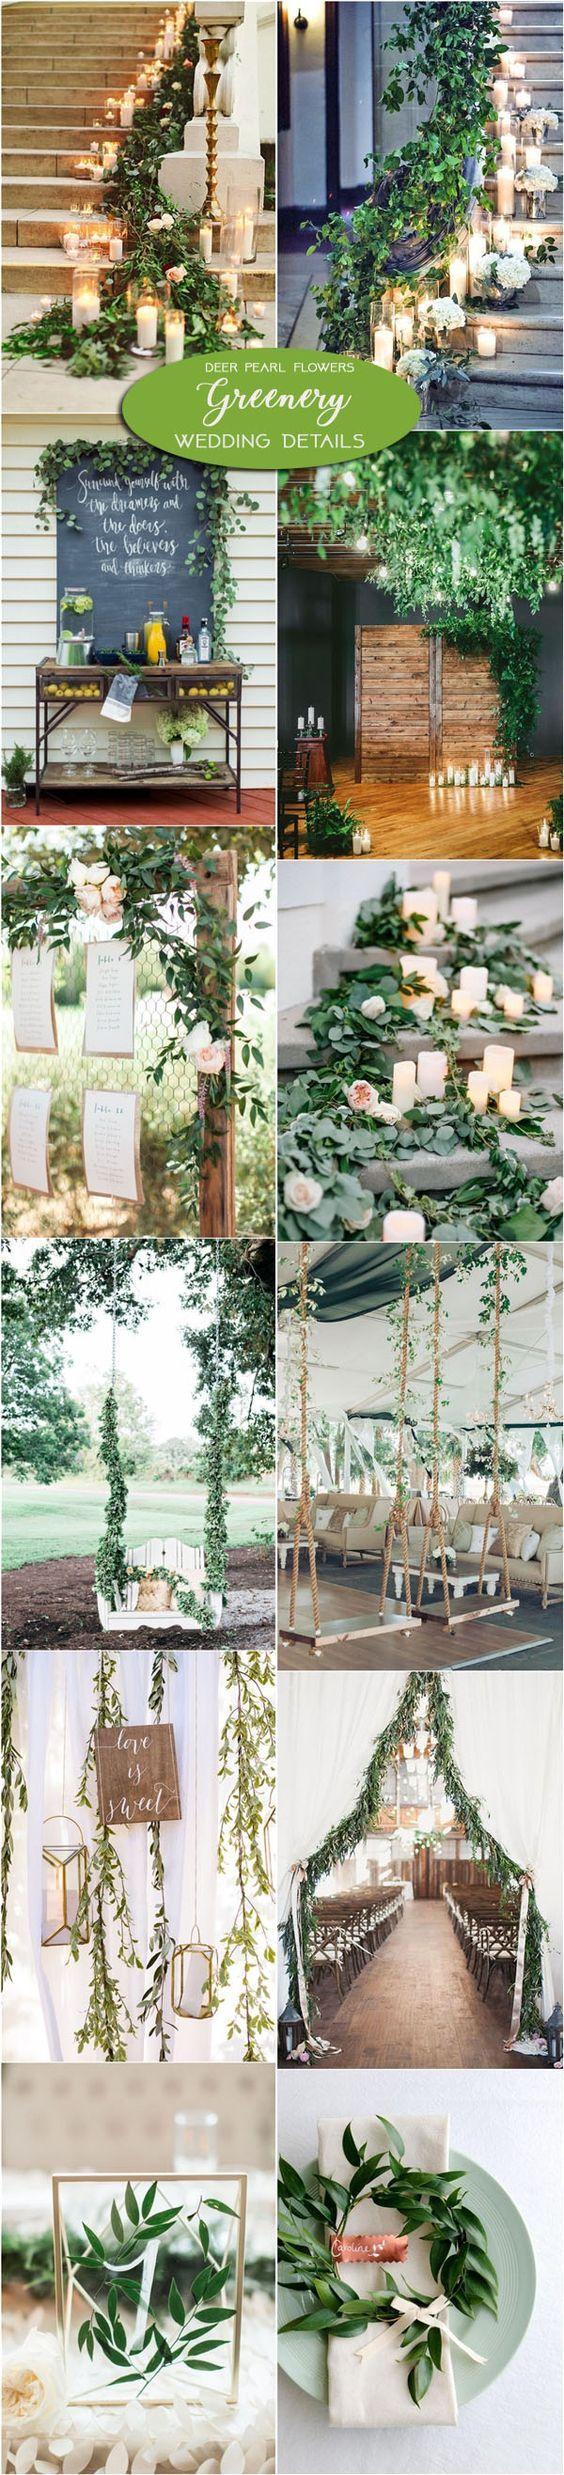 Greenery wedding color ideas & wedding decors / http://www.deerpearlflowers.com/greenery-wedding-decor-ideas/3/